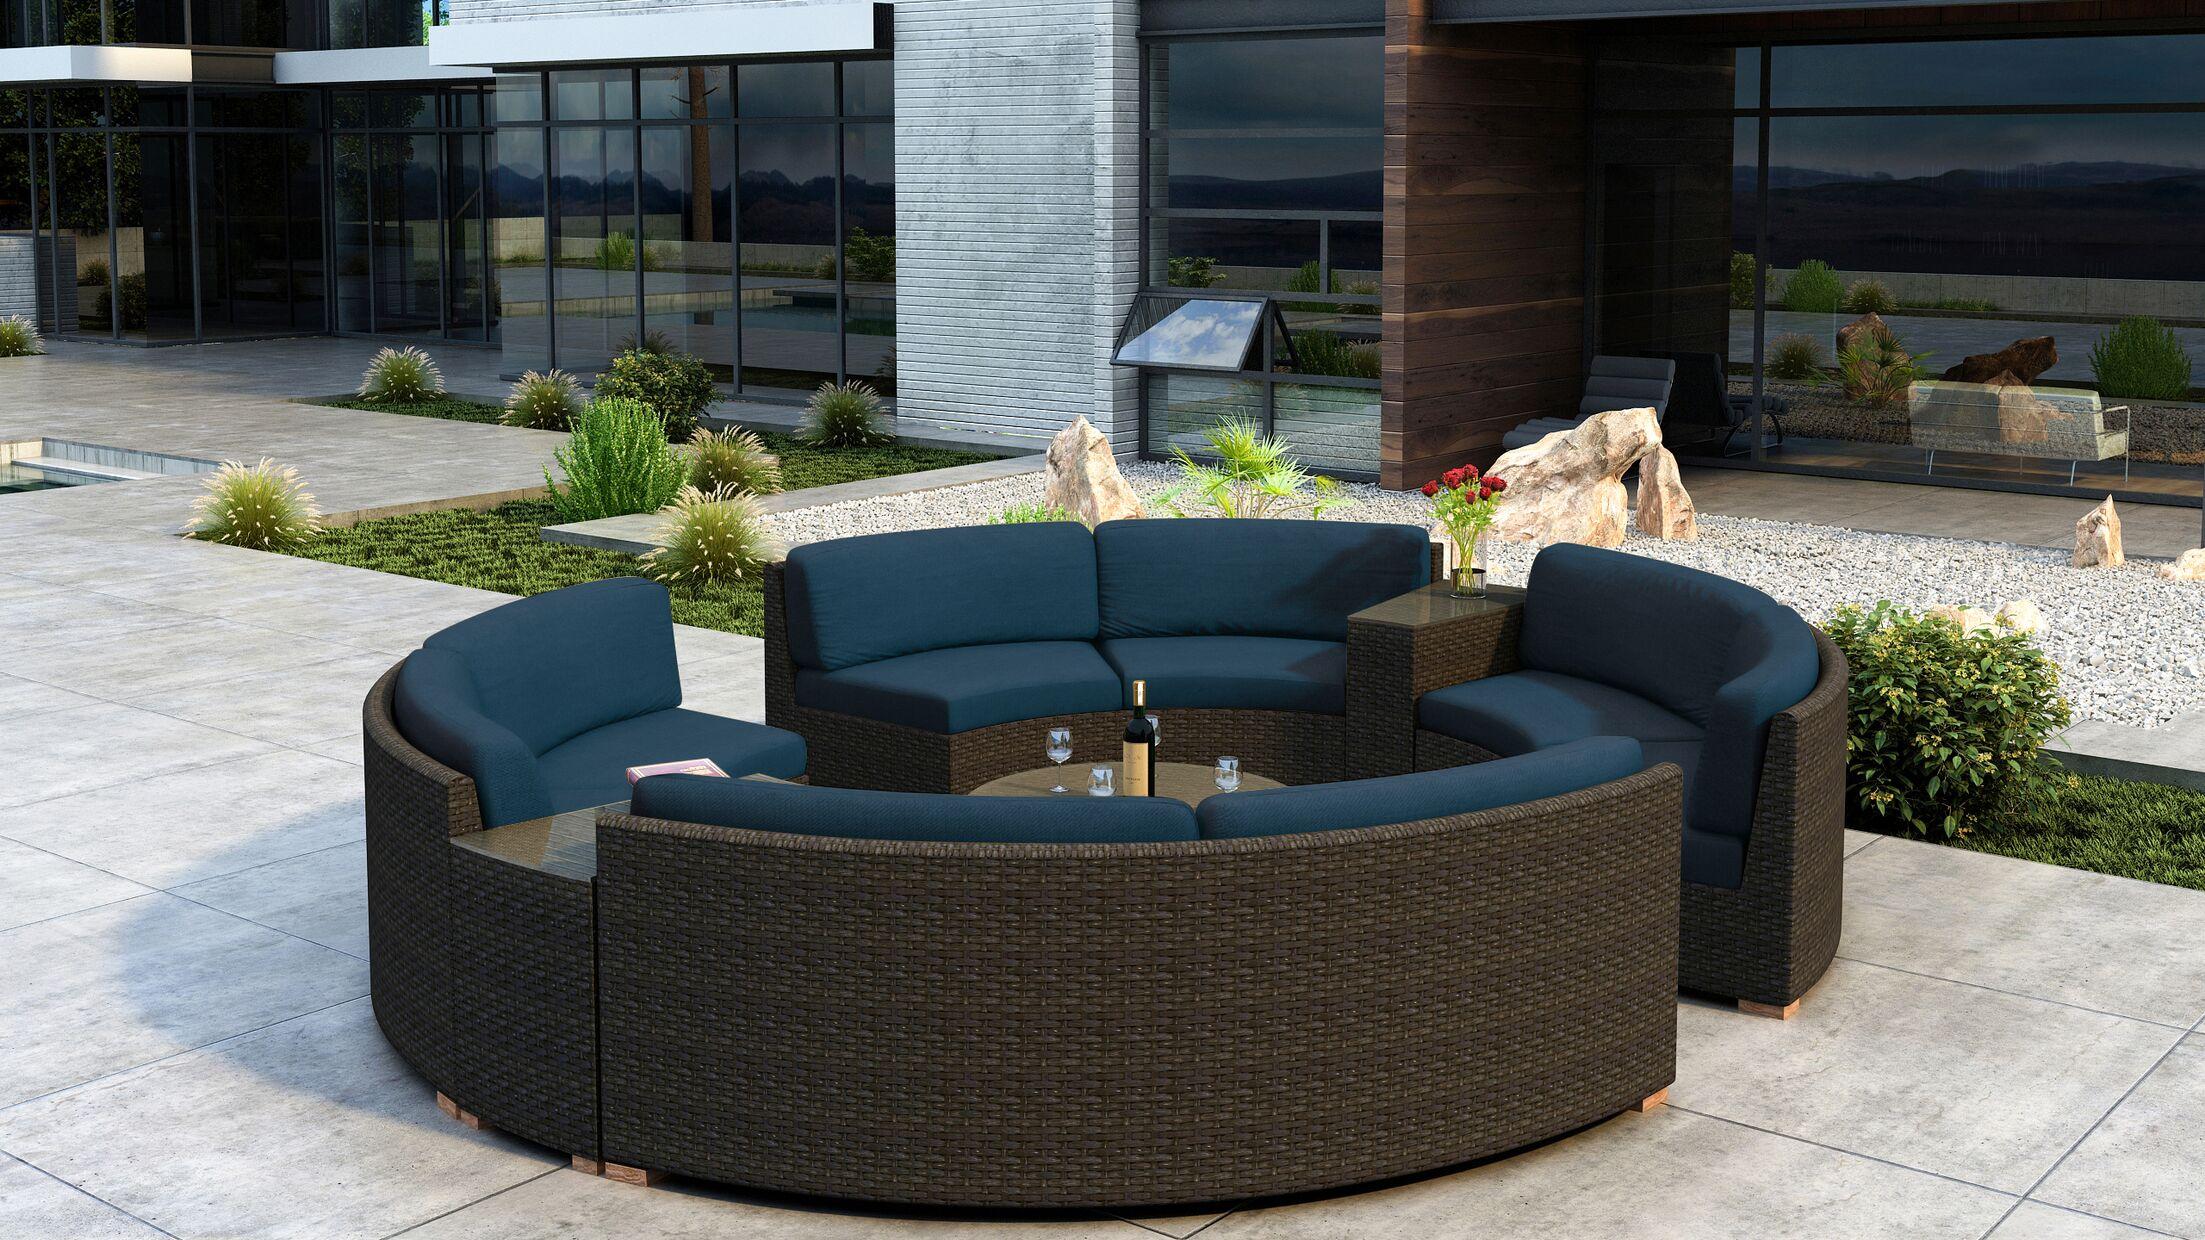 Glen Ellyn 7 Piece Sectional Set with Sunbrella Cushion Cushion Color: Spectrum Indigo